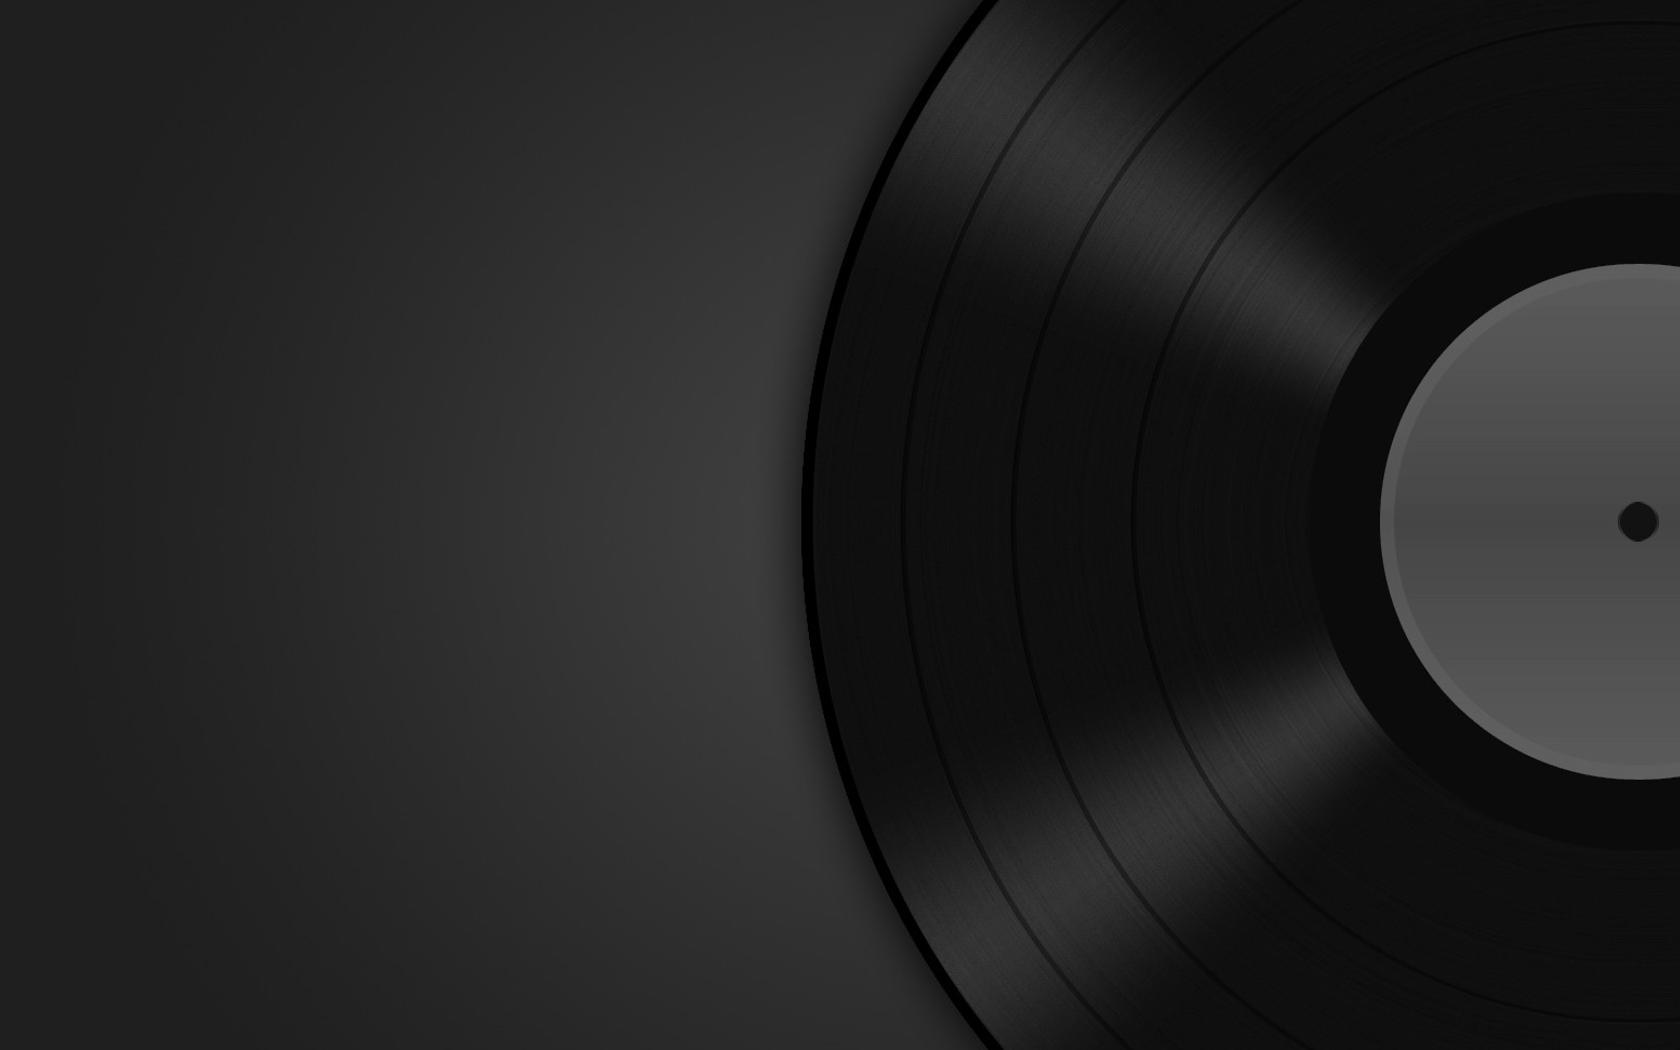 Desktop Backgrounds Music 1680x1050